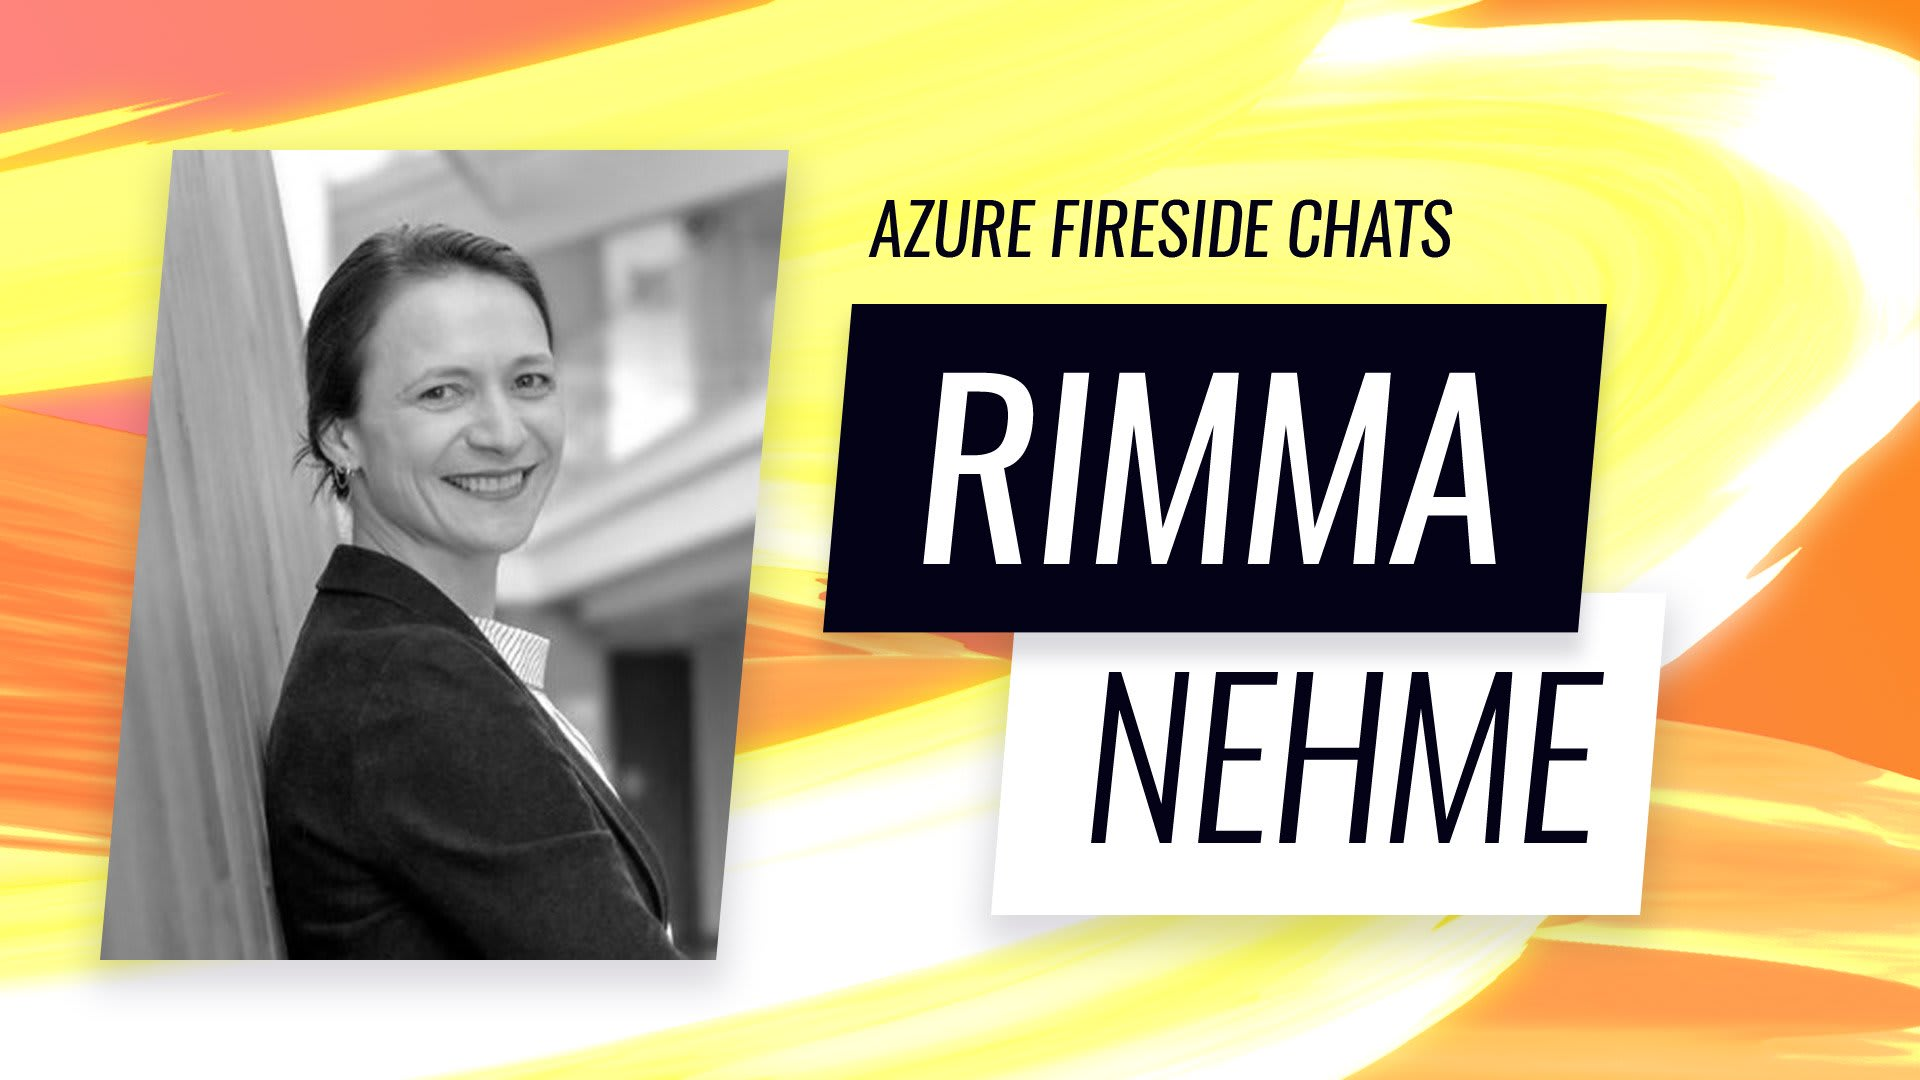 fireside-rimma-nehme-1